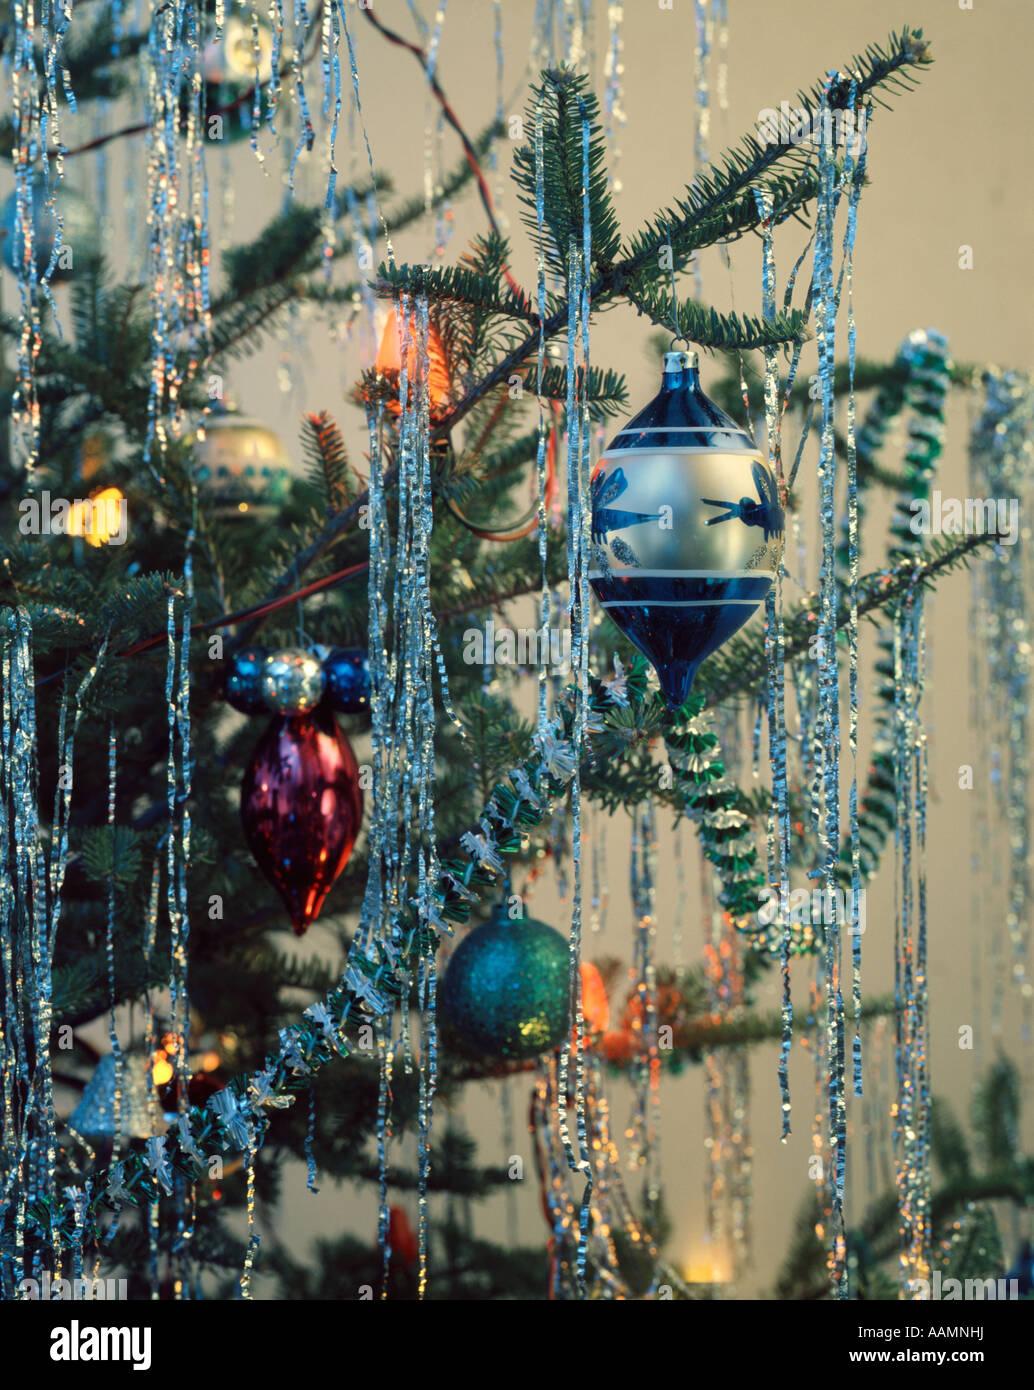 1970 1970 RETRO CHRISTMAS TREE ORNAMENT GARLAND LIGHTS Photo Stock